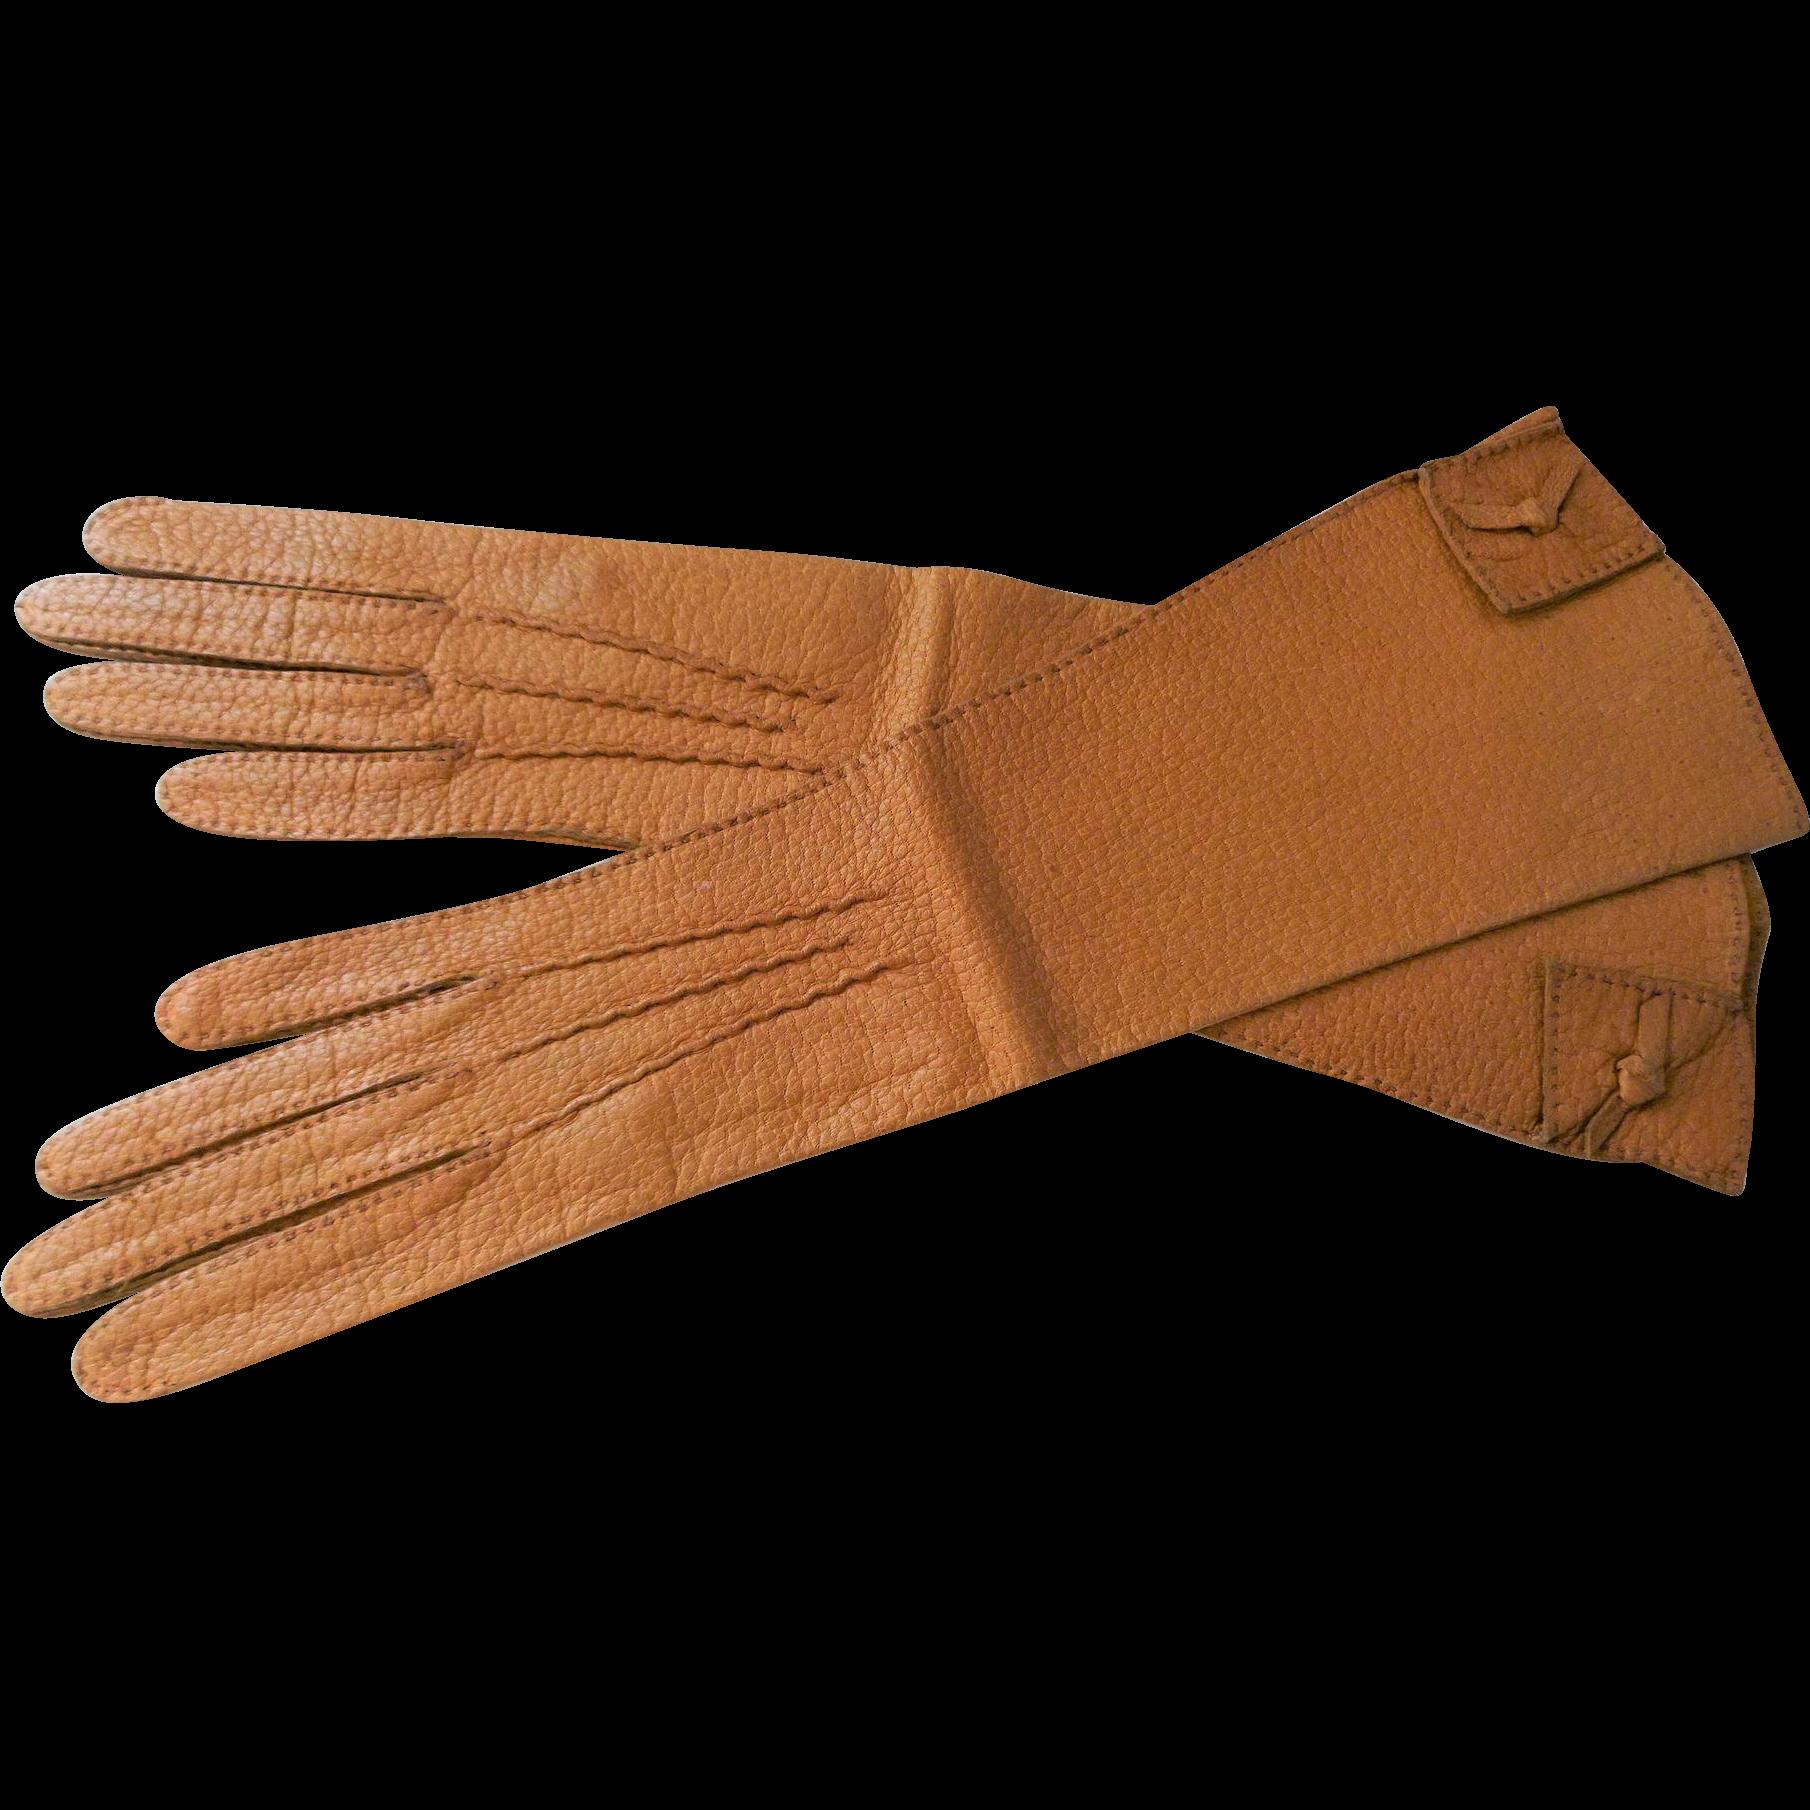 Vintage ladies leather opera gloves - Vintage 1960s Camel Kid Leather Womens Opera Gloves